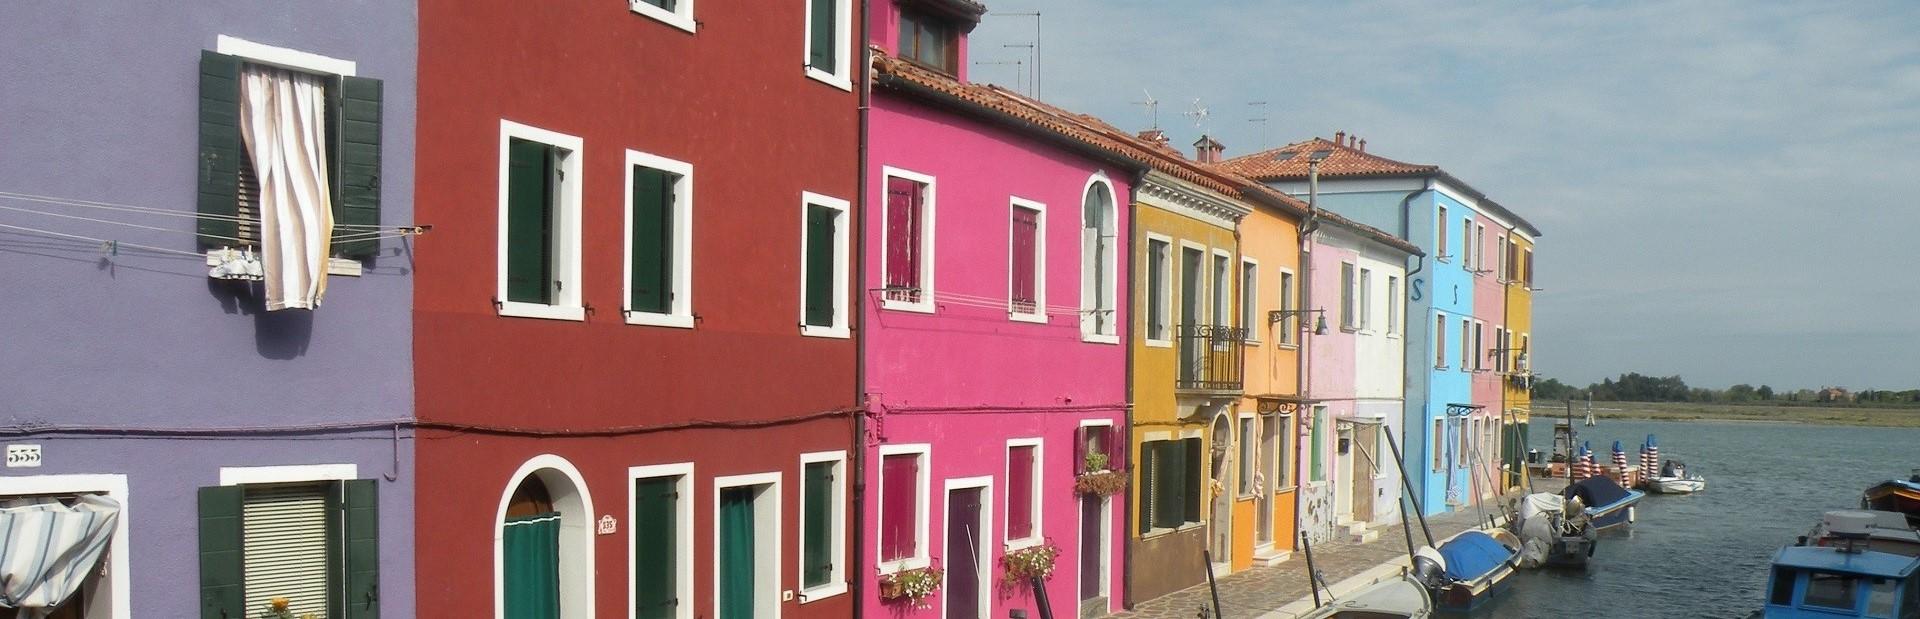 Italy slide Burano_Fondamenta_Pontinello_Sinistra